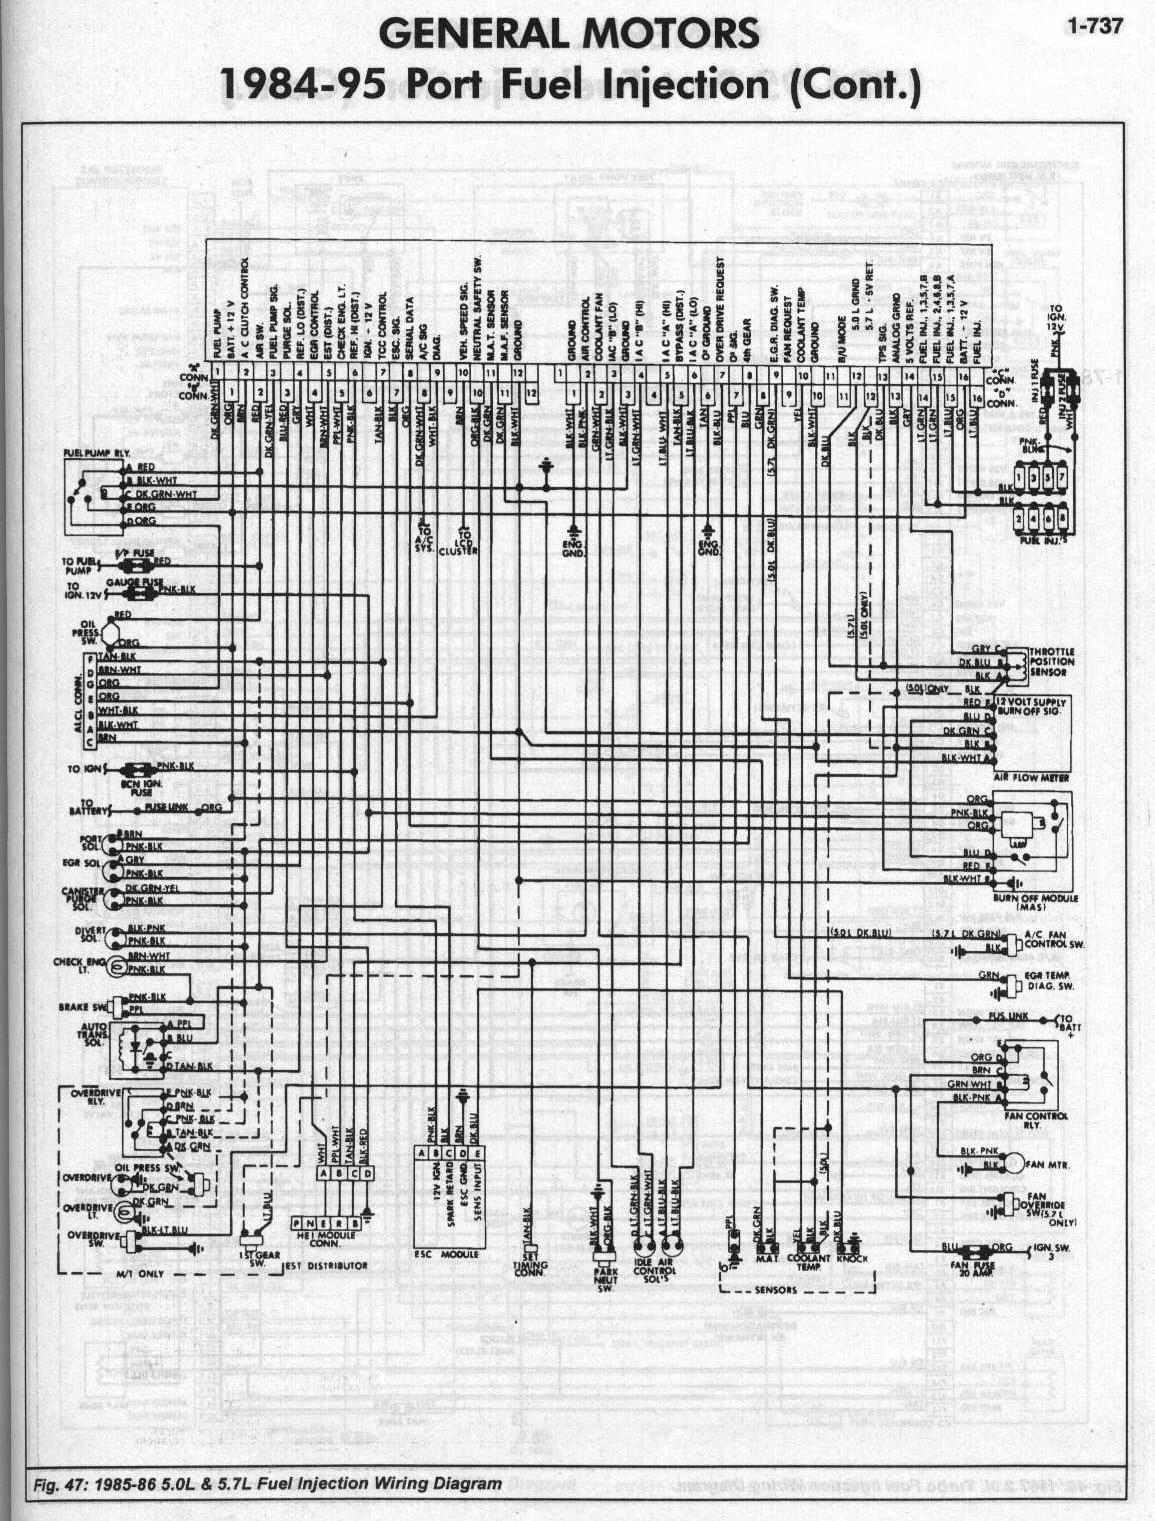 1991 Chevy Kodiak Wiring Diagram My 85 Z28 And Eprom Project